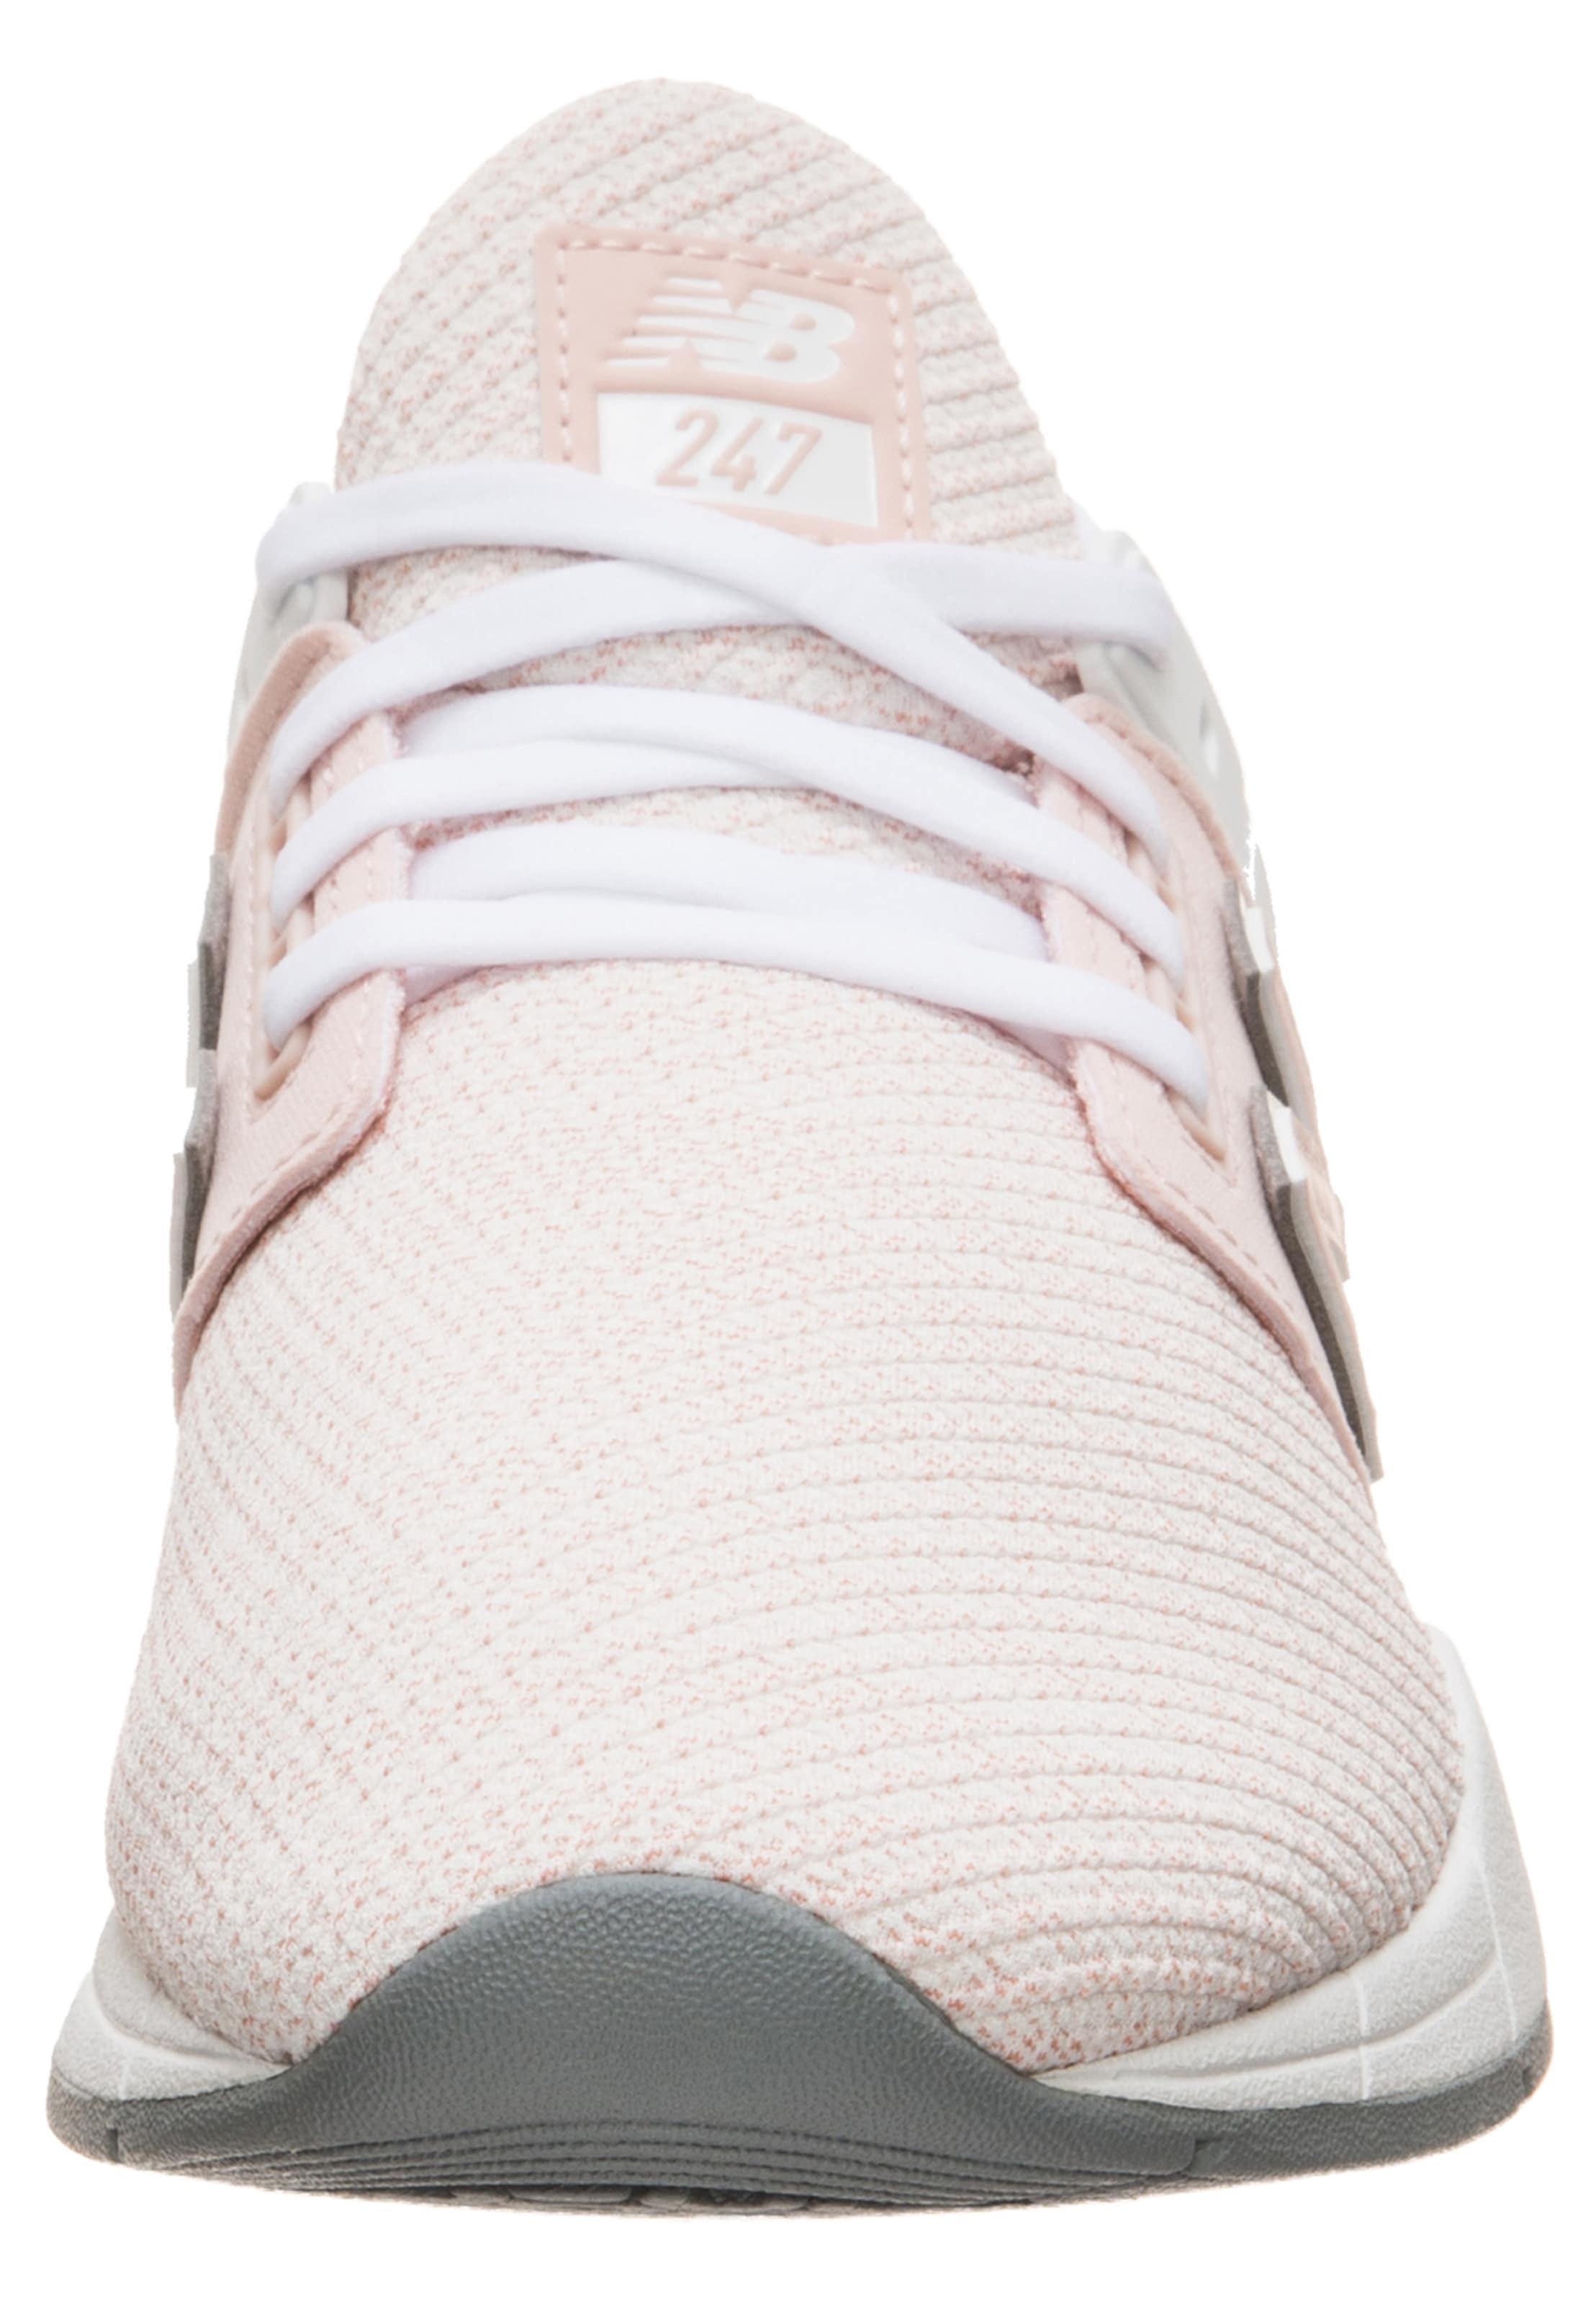 Balance b' In AltrosaWeiß New Sneaker 'ws247 rdoeCxB